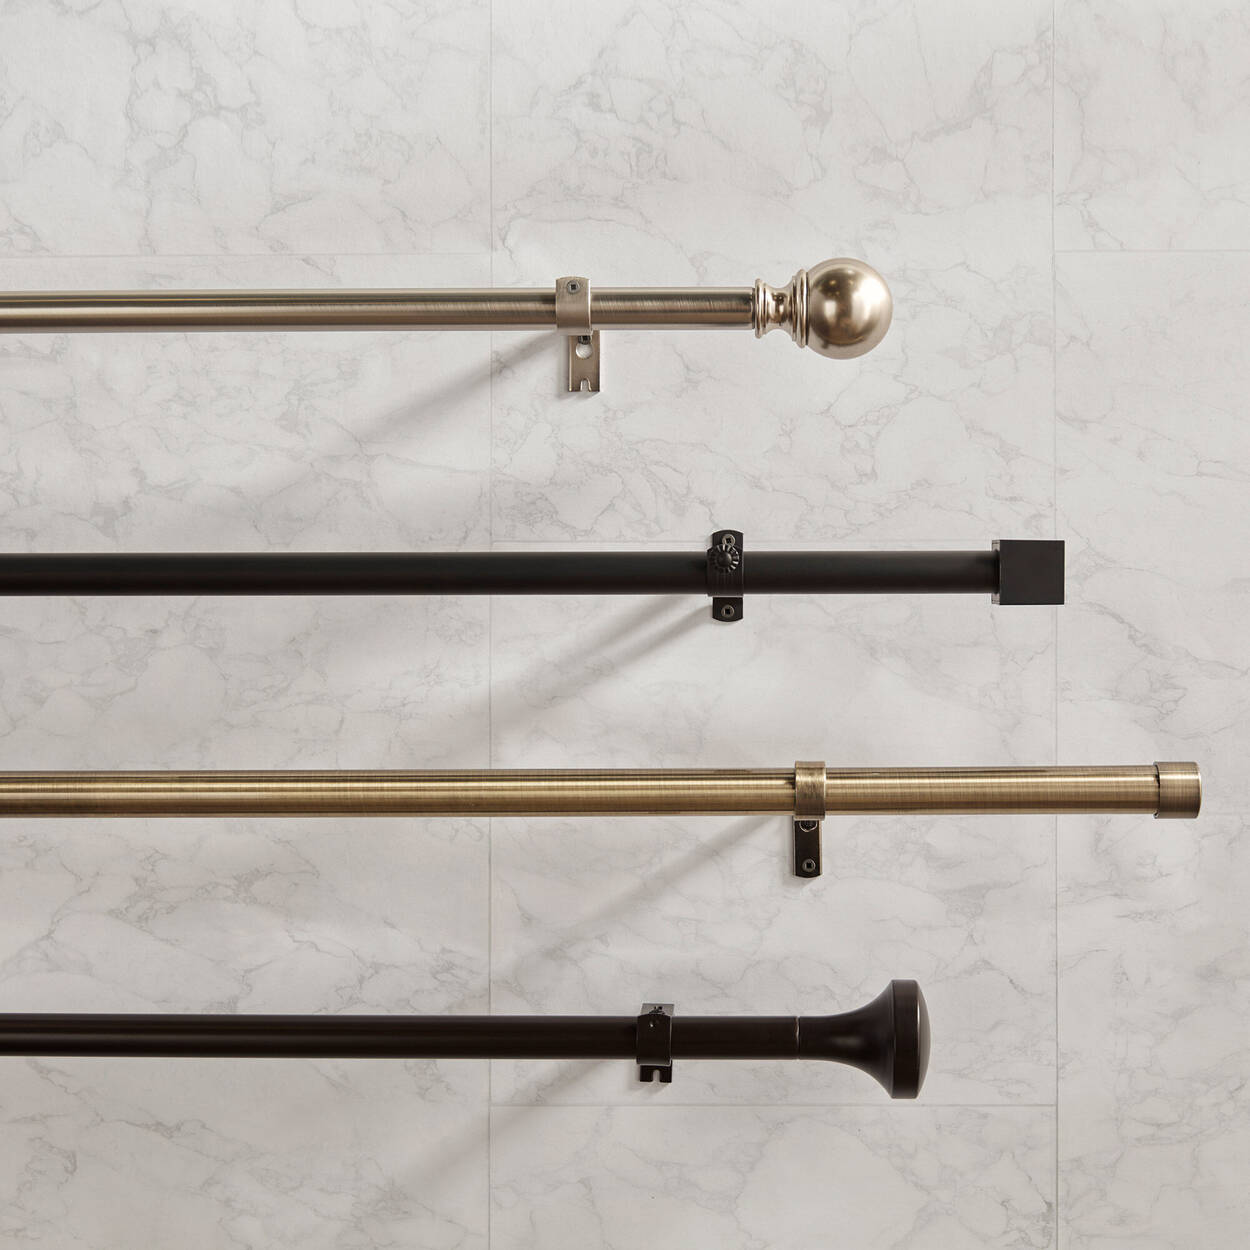 Curtain Rod Set - Diameter 28 mm